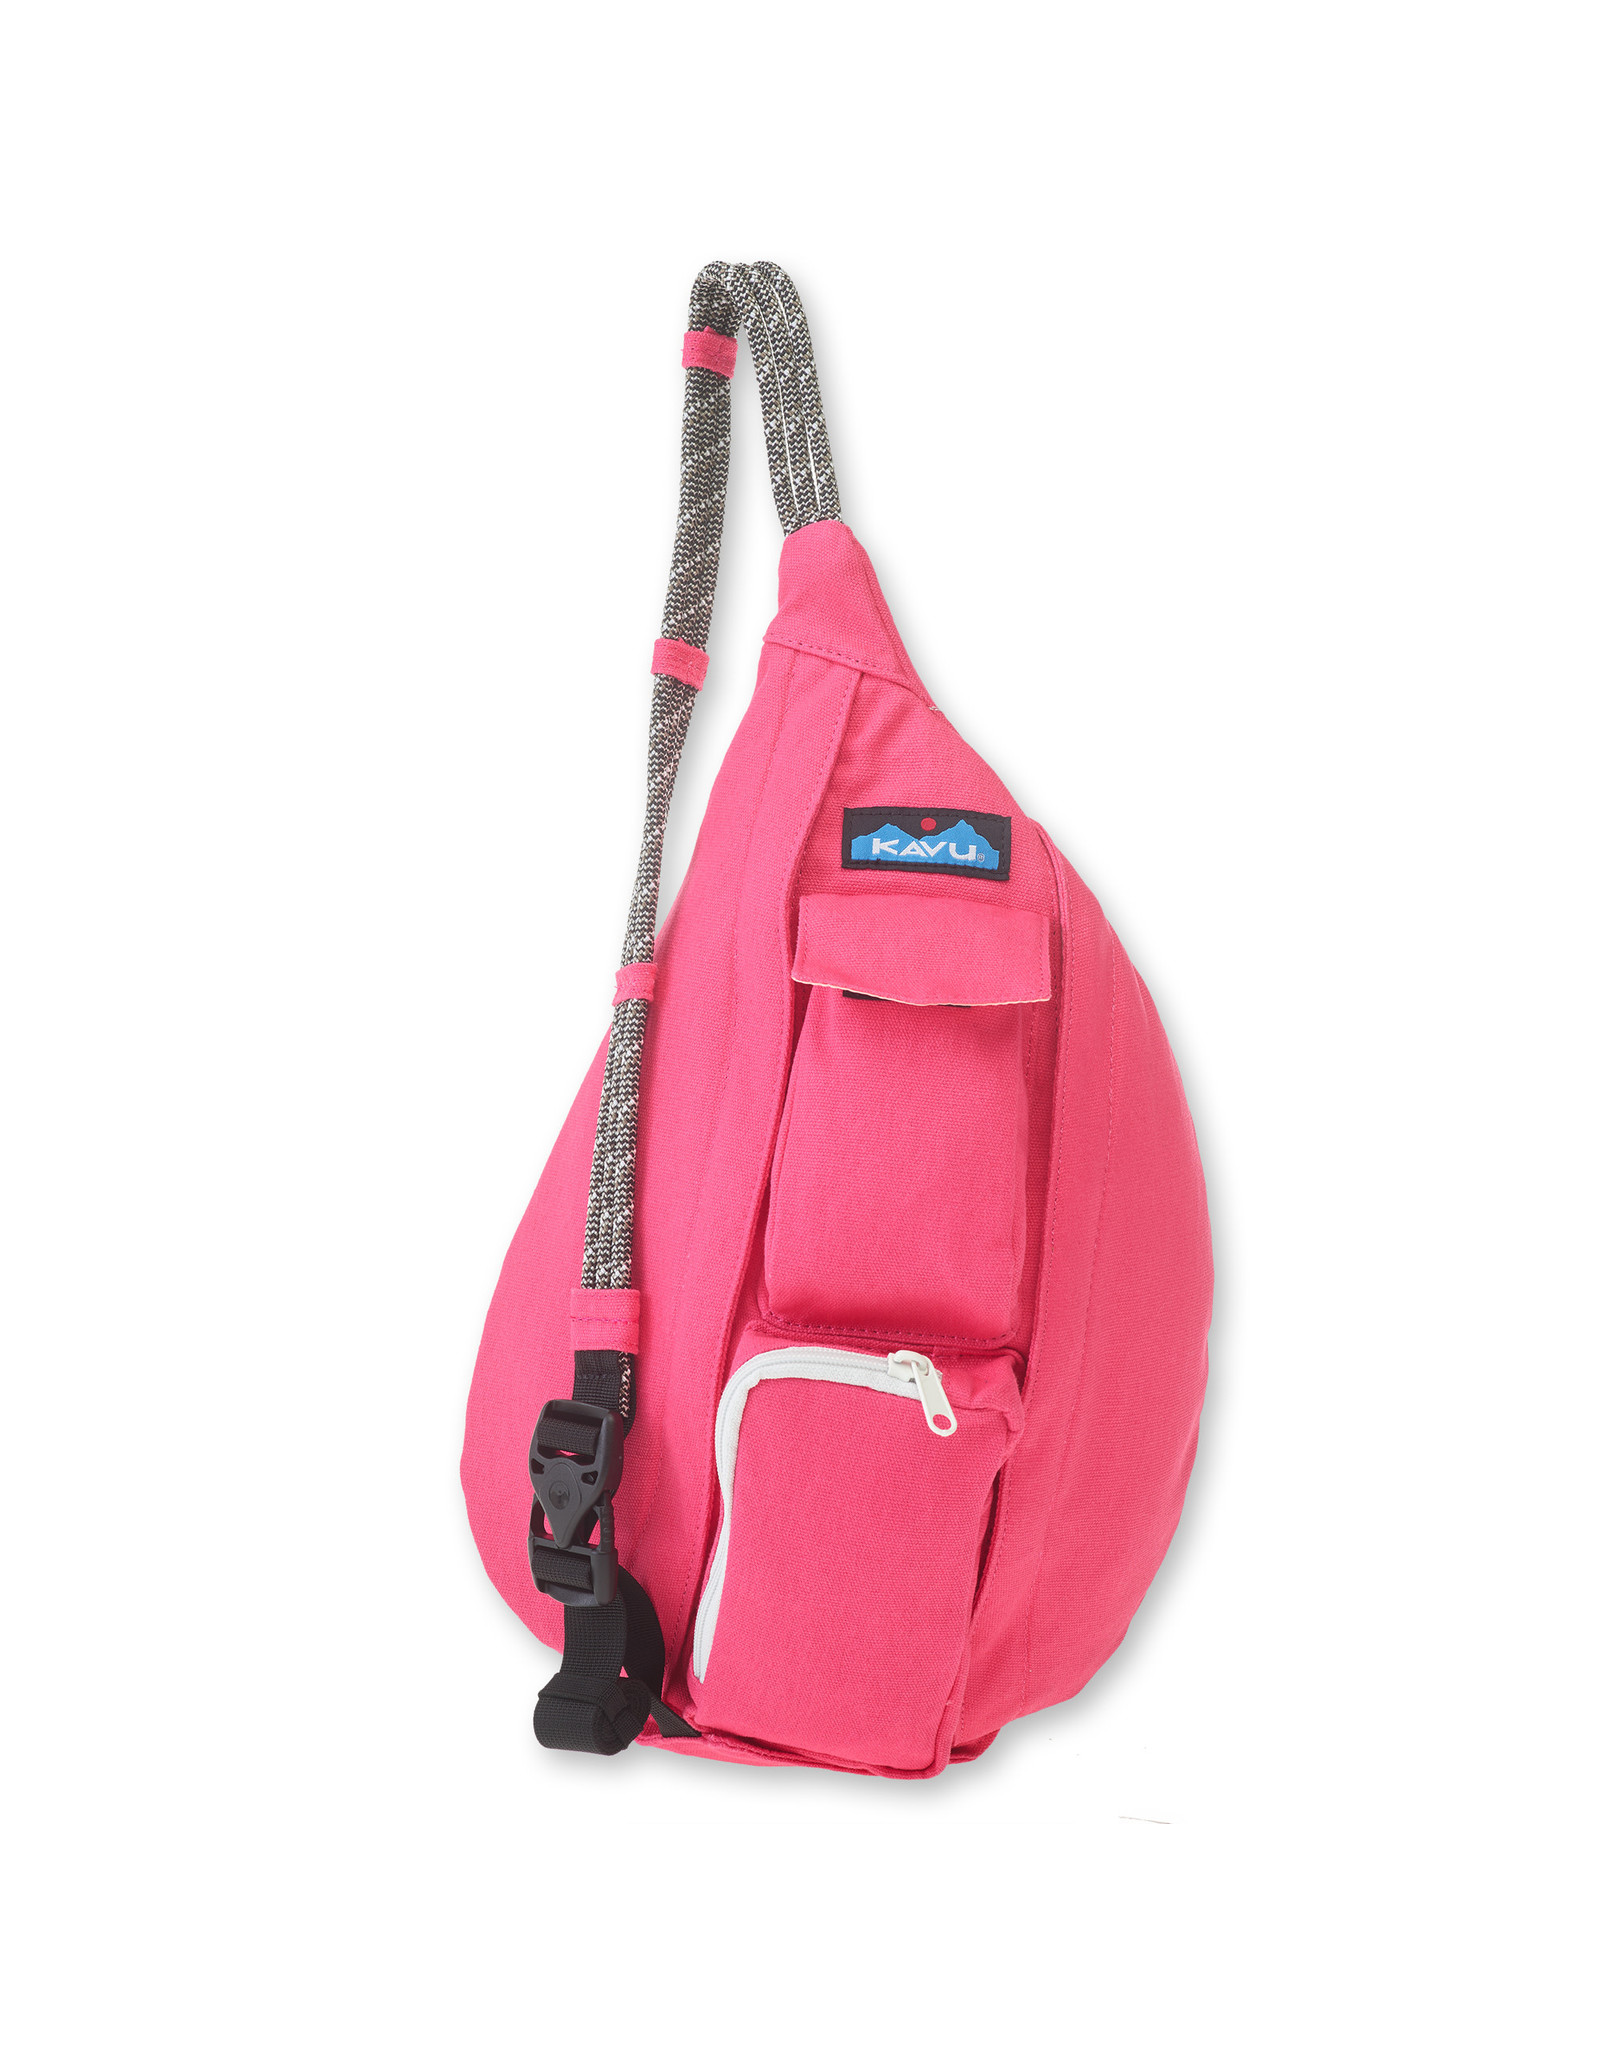 Kavu Mini Rope Bag - Magenta